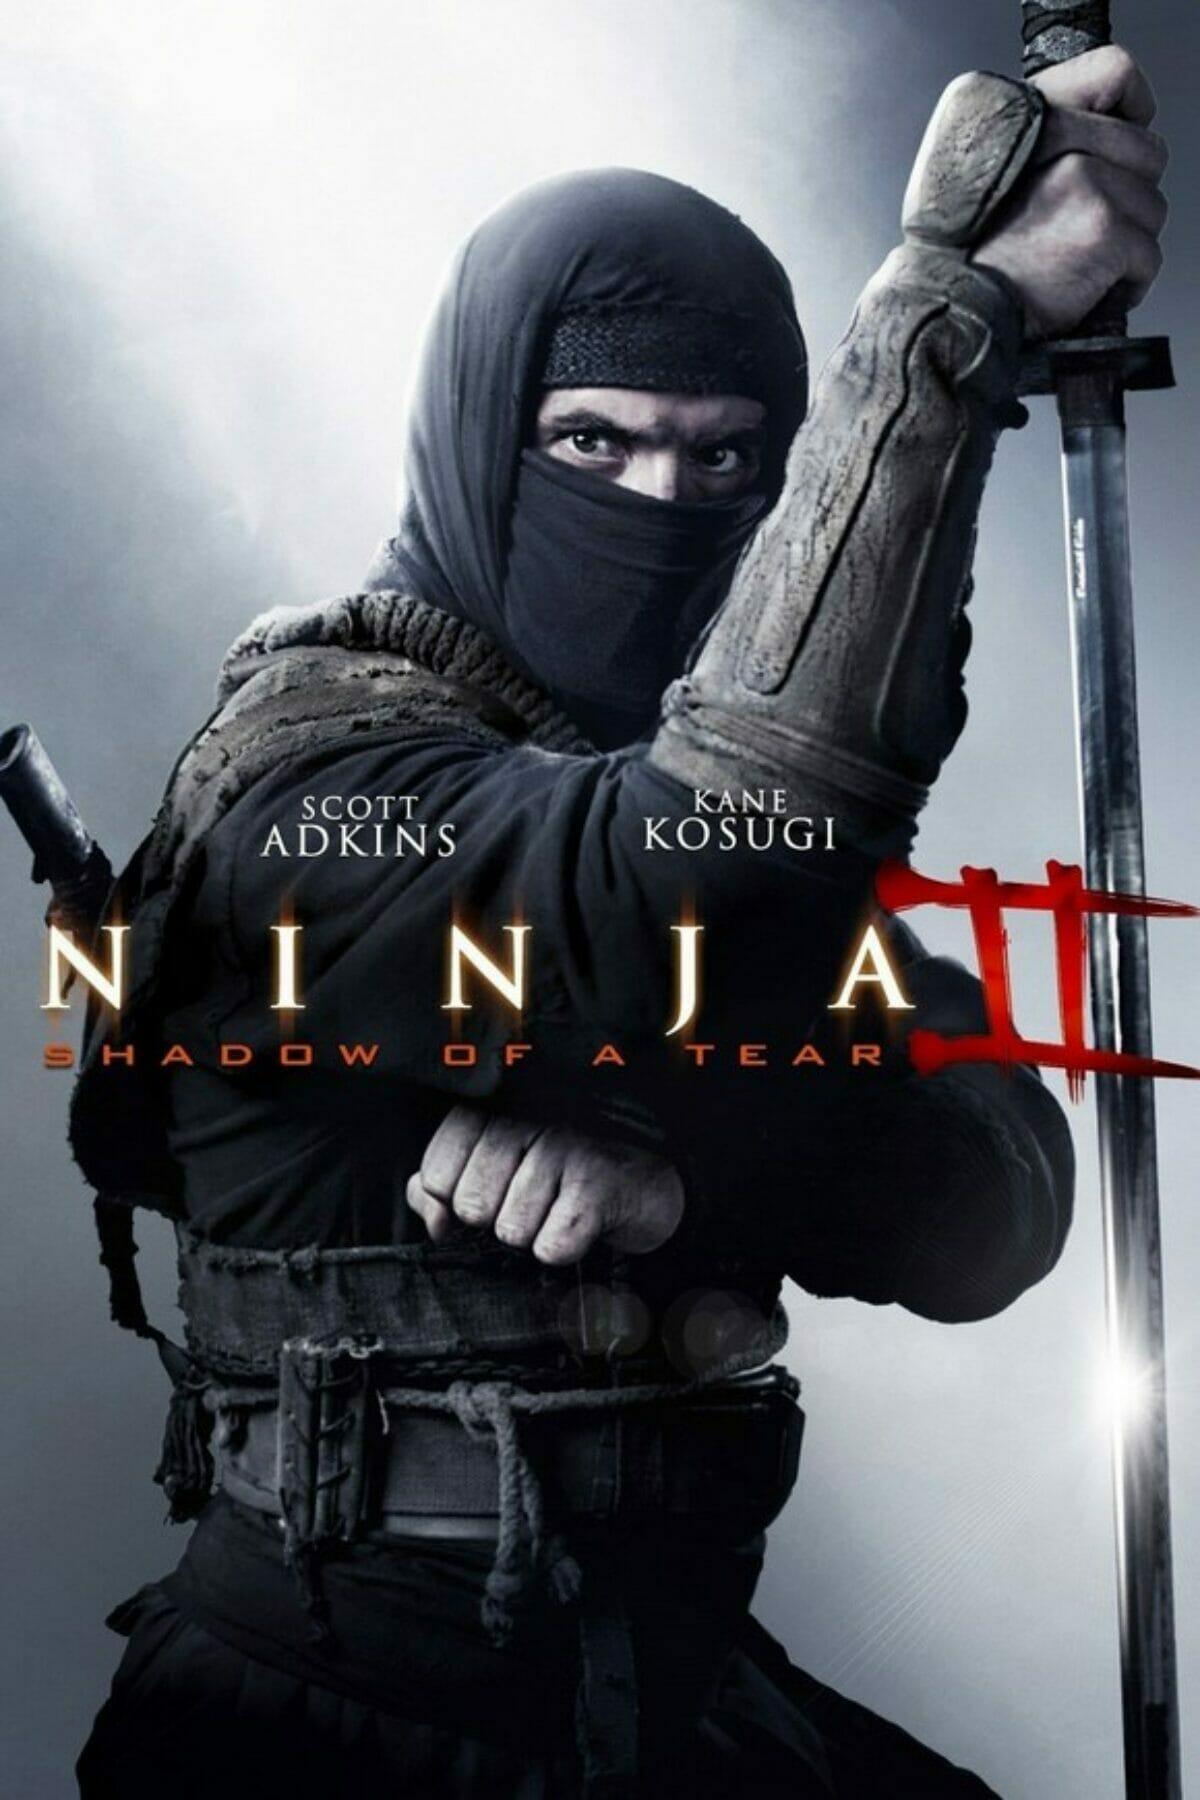 Ninja-II-Shadow-of-a-Tear-affiche